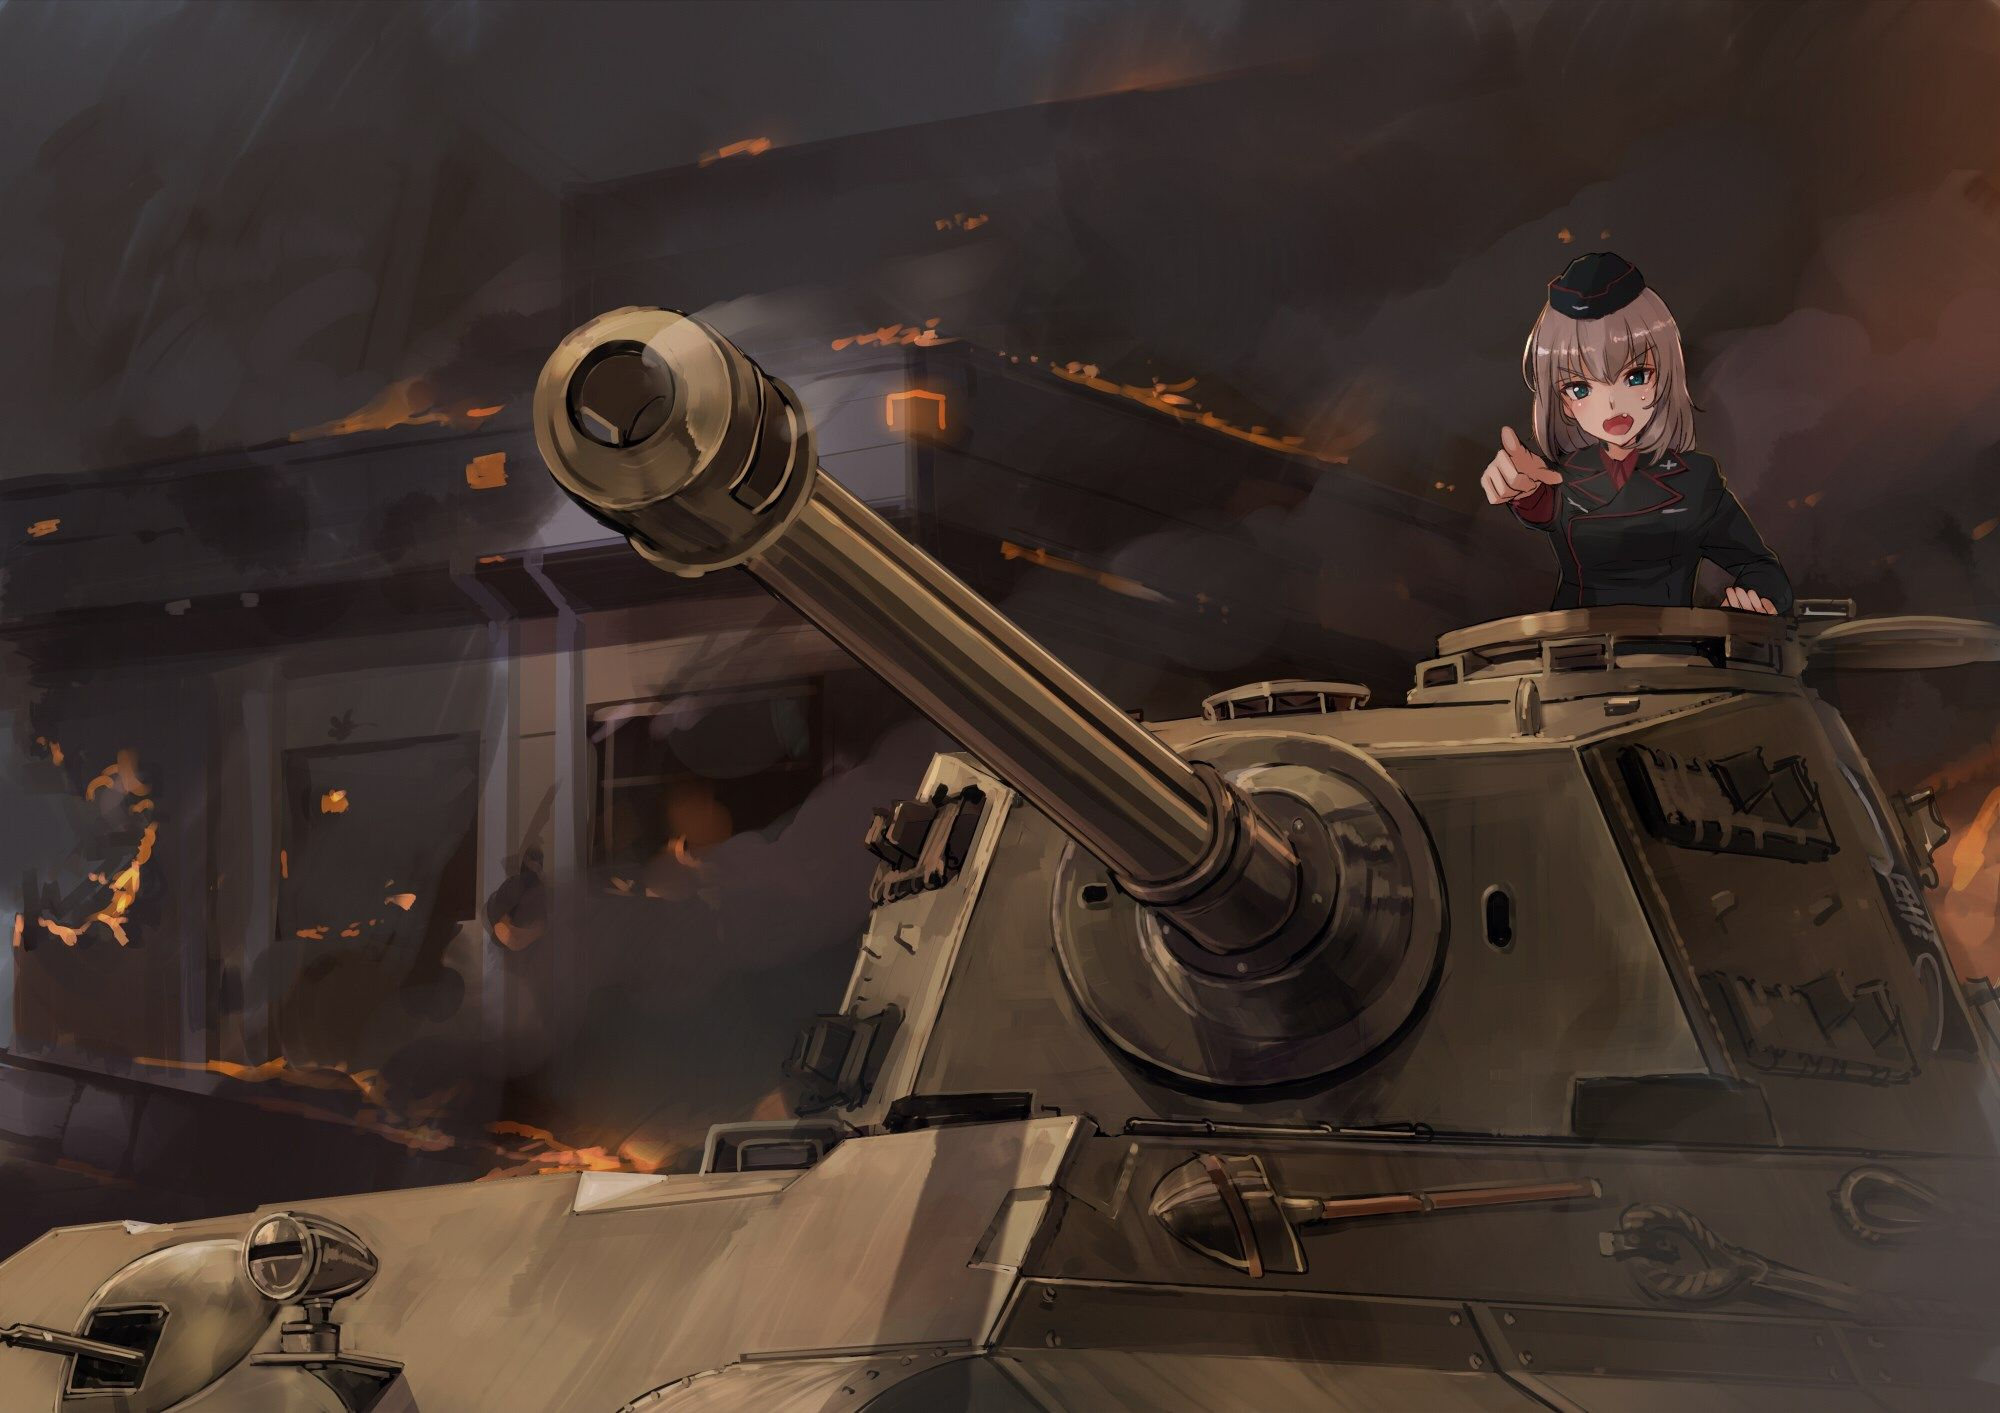 Girls Und Panzer Free Desktop Wallpaper Girls Und Panzer Category ทหาร สาวอน เมะ อะน เมะ